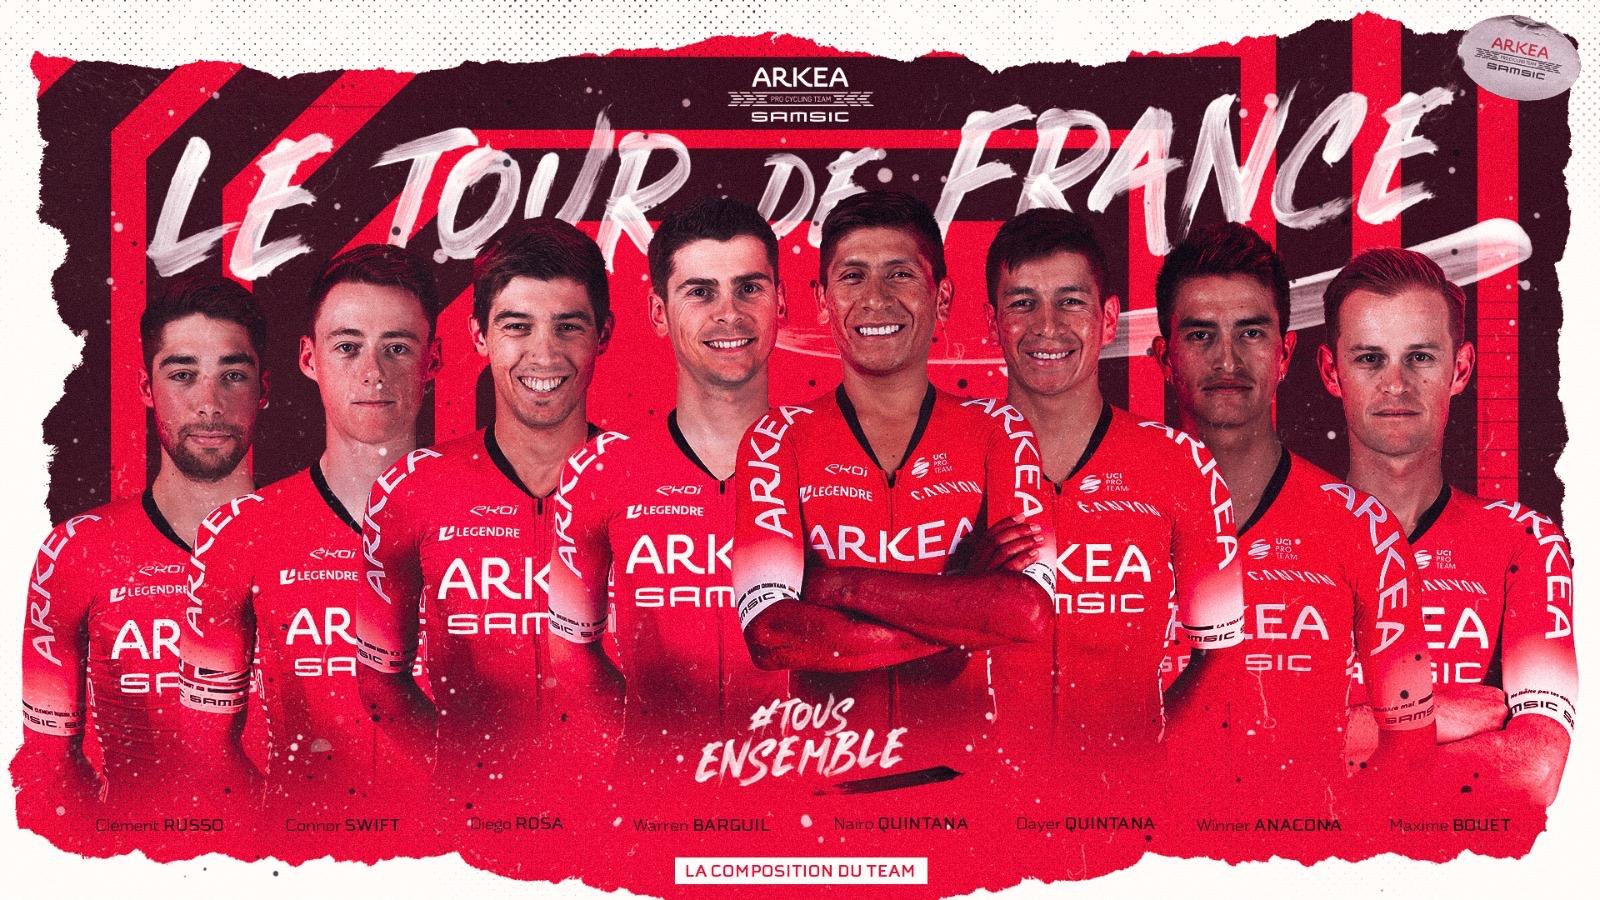 Presentation of Team Arkea Samsic on the Tour de France 2020